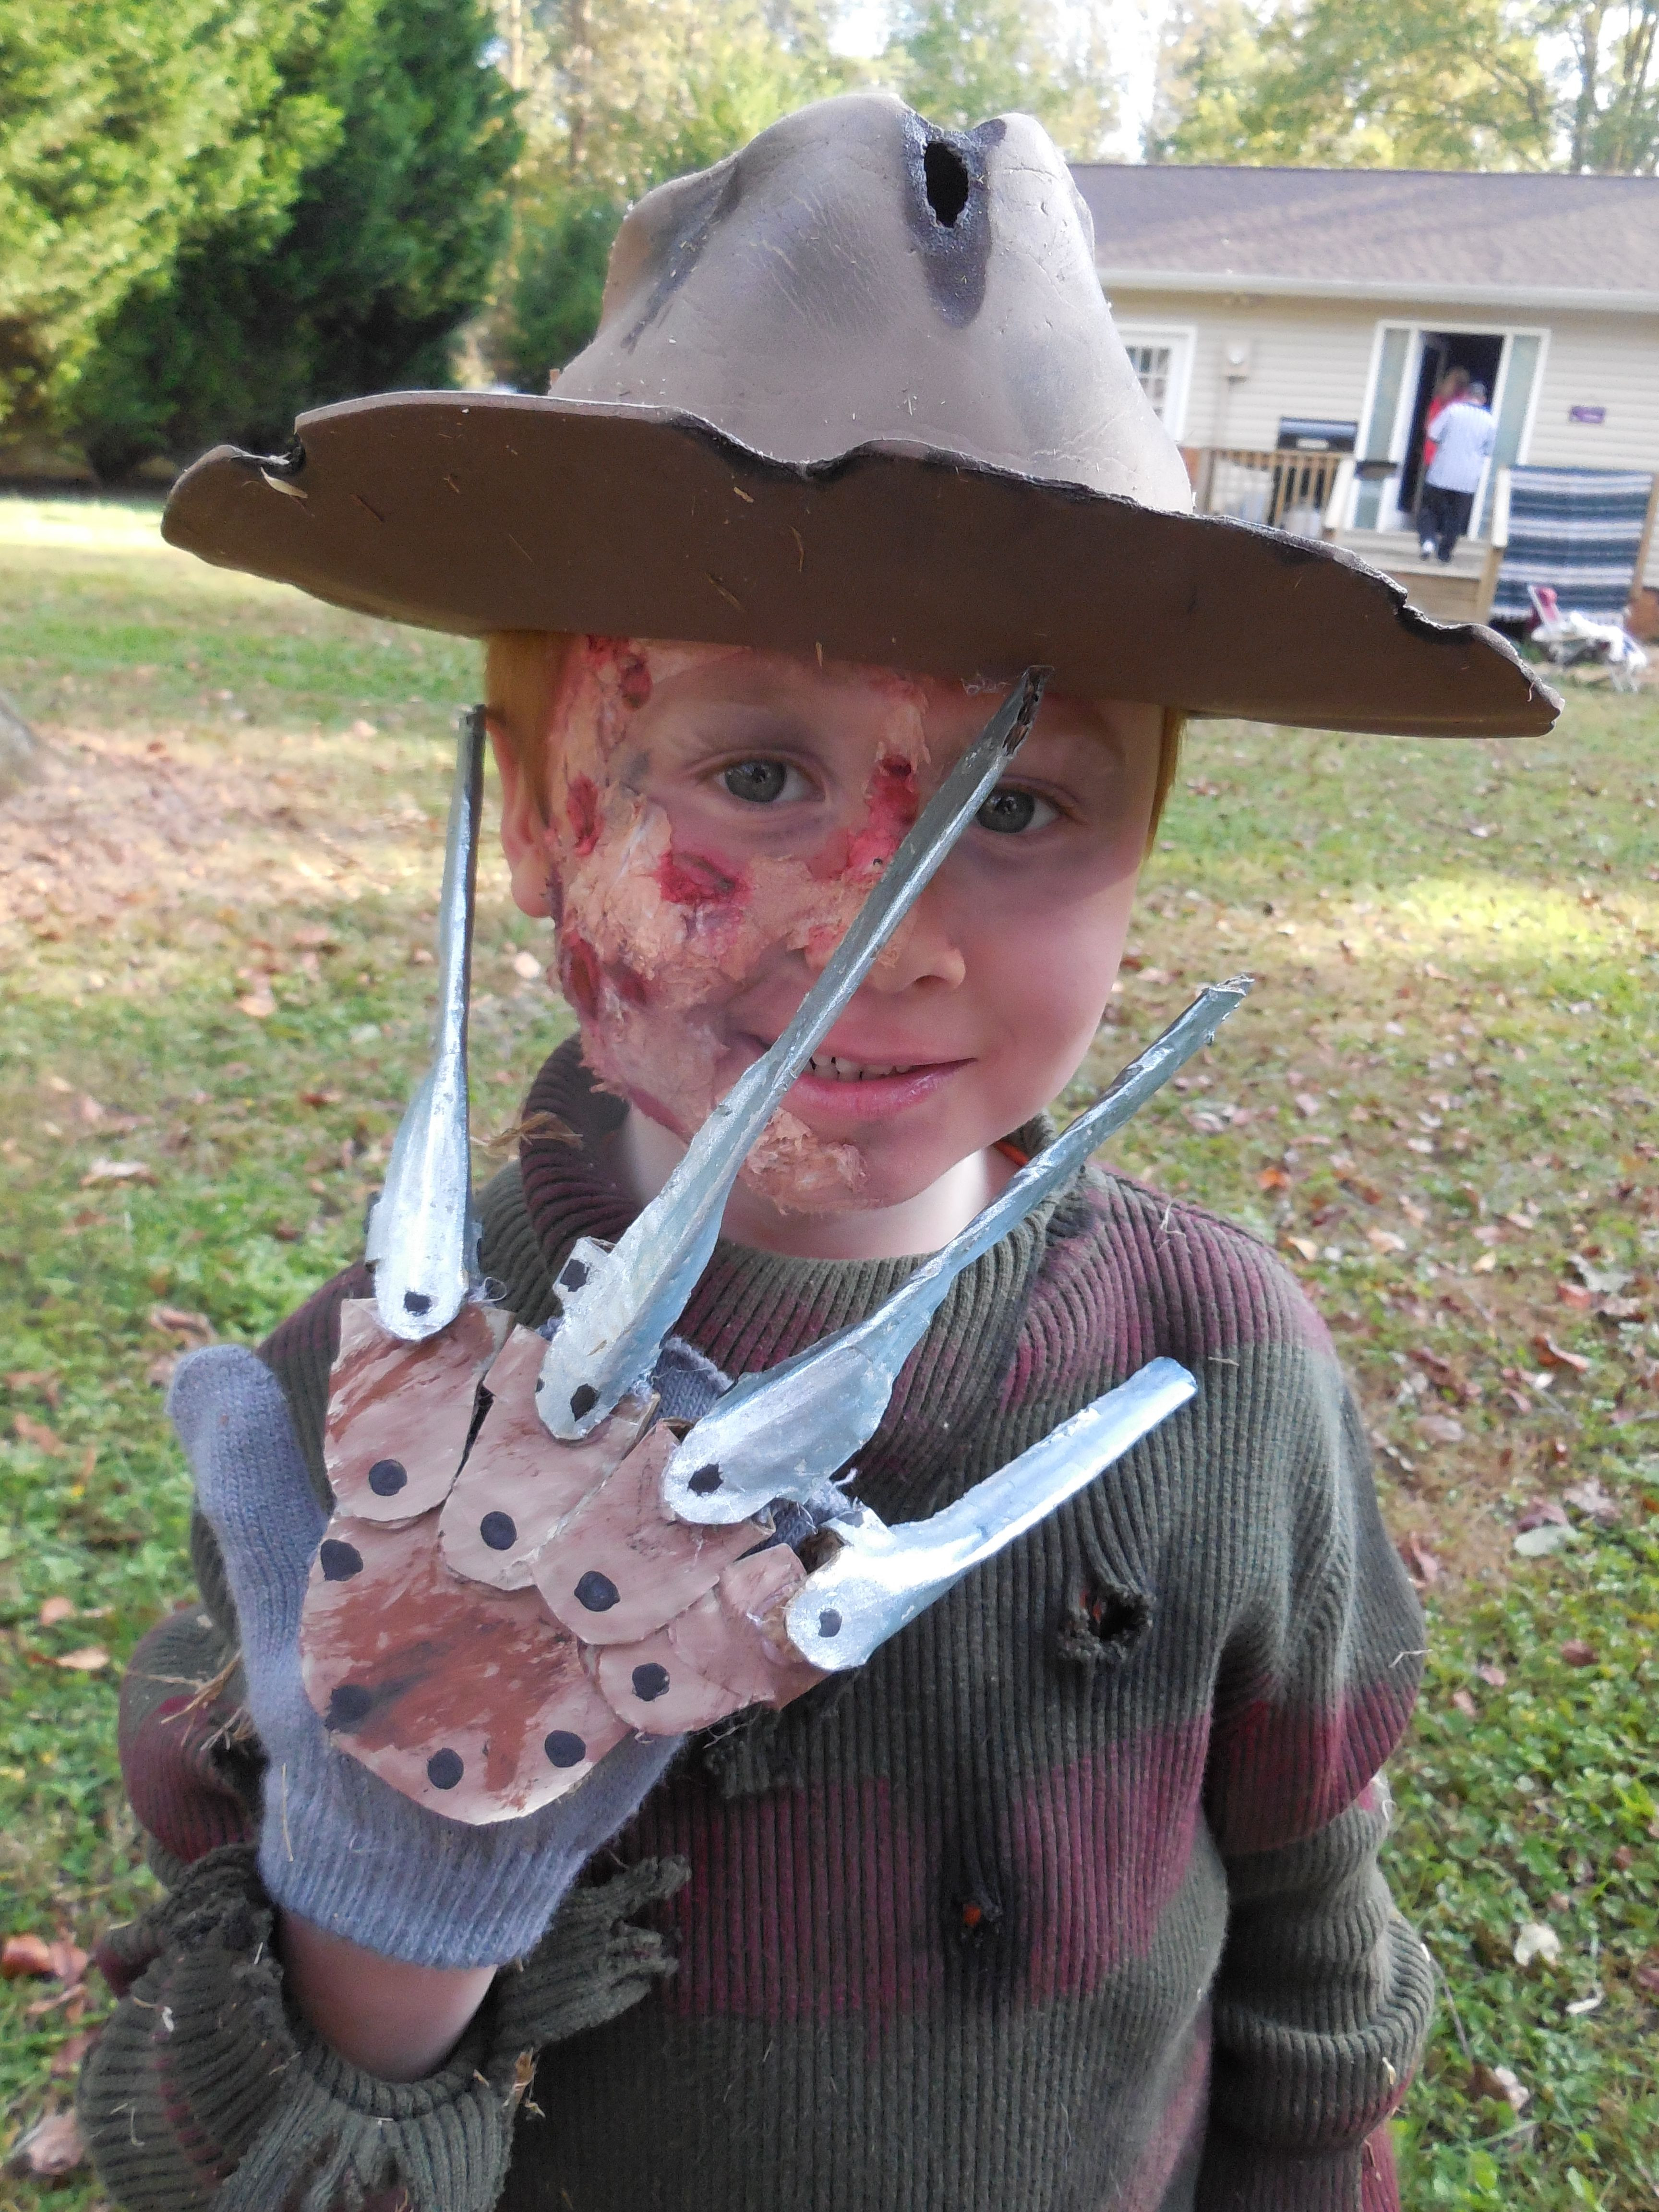 Best ideas about Freddy Krueger Costume DIY . Save or Pin My DIY freddy krueger costume for my son Now.